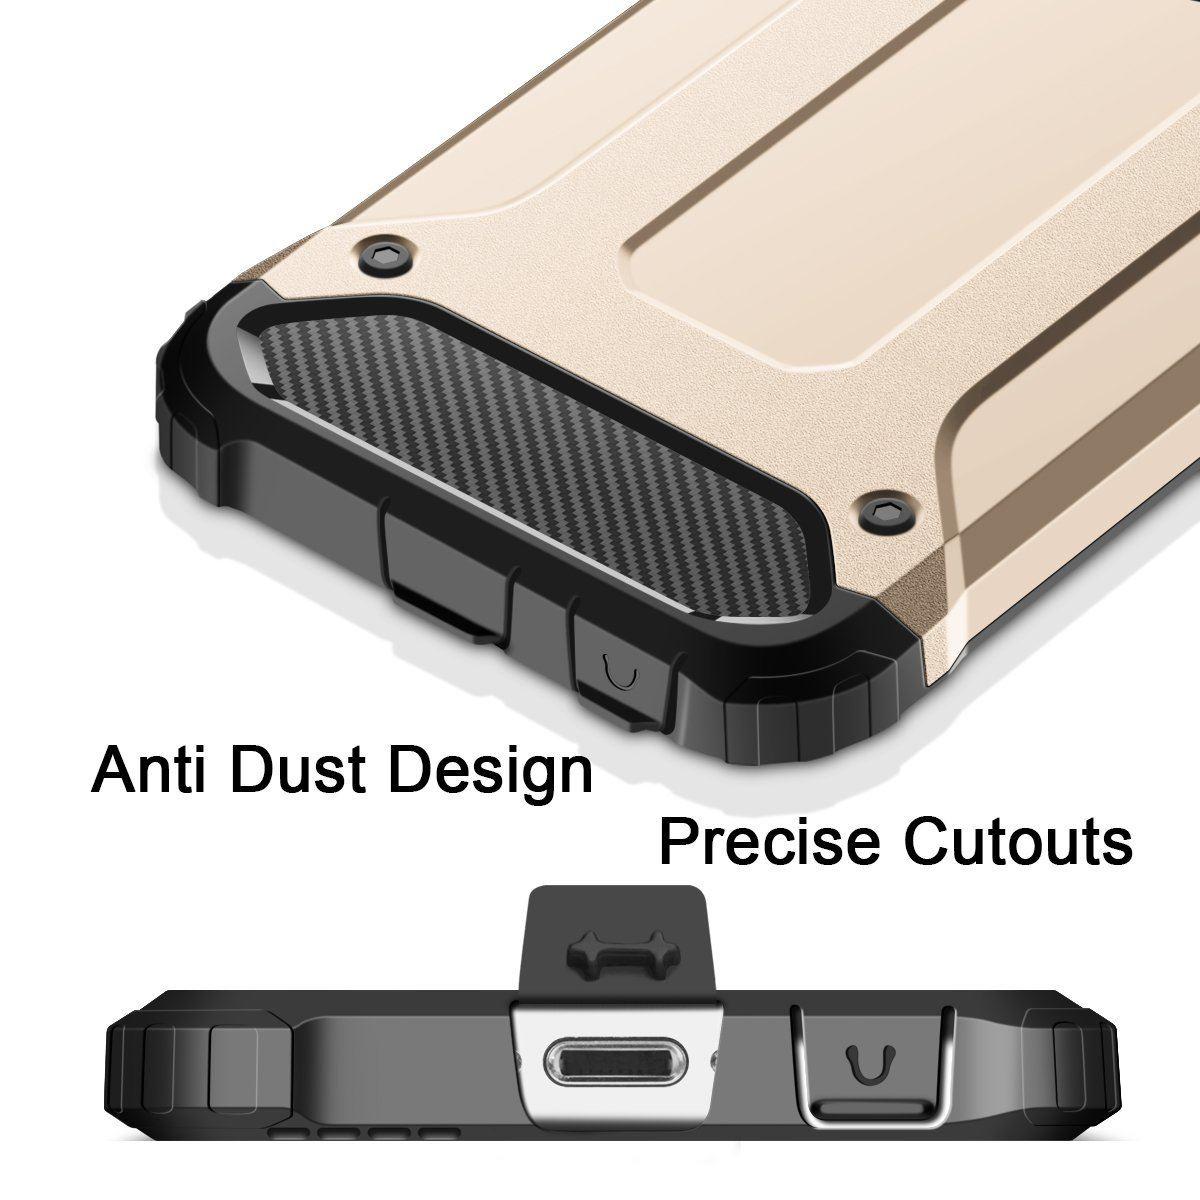 thumbnail 42 - For Apple iPhone 11 Pro Max XR Xs X 8 7 Plus 6 5 Se Case Cover Tough Armor